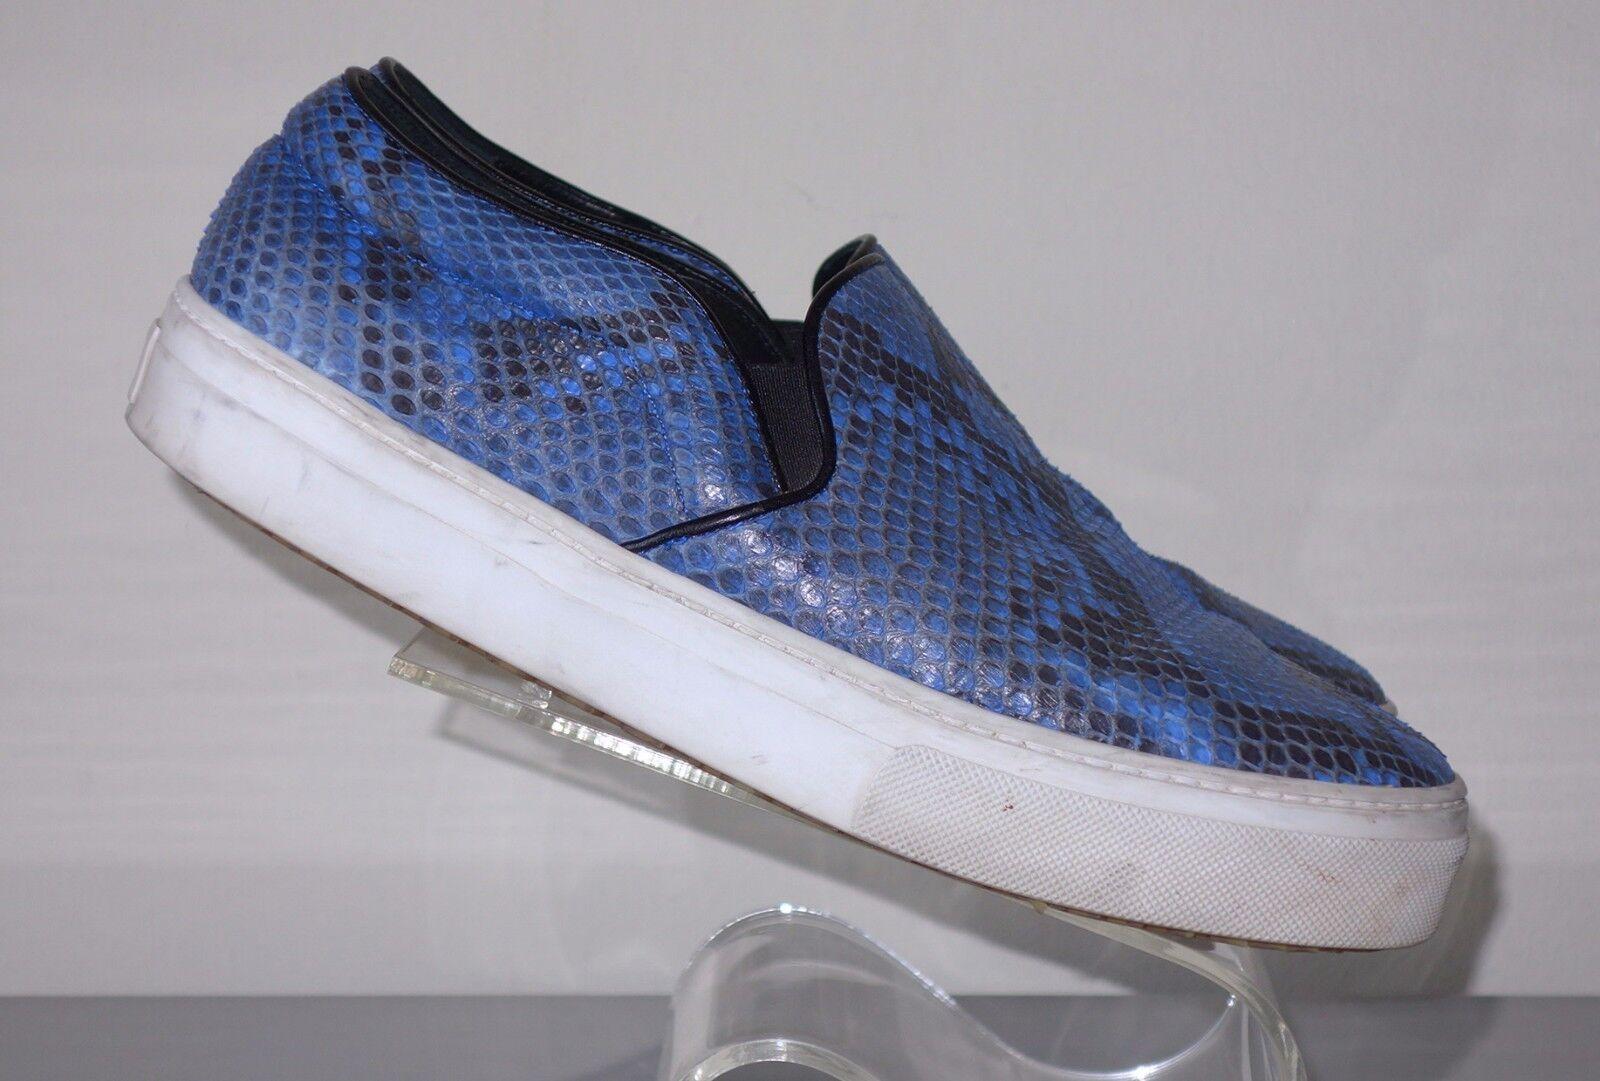 CELINE    Phoebe Philo blu Snakeskin Slip-On Skater scarpe da ginnastica Sz 38 1 2 996ad5